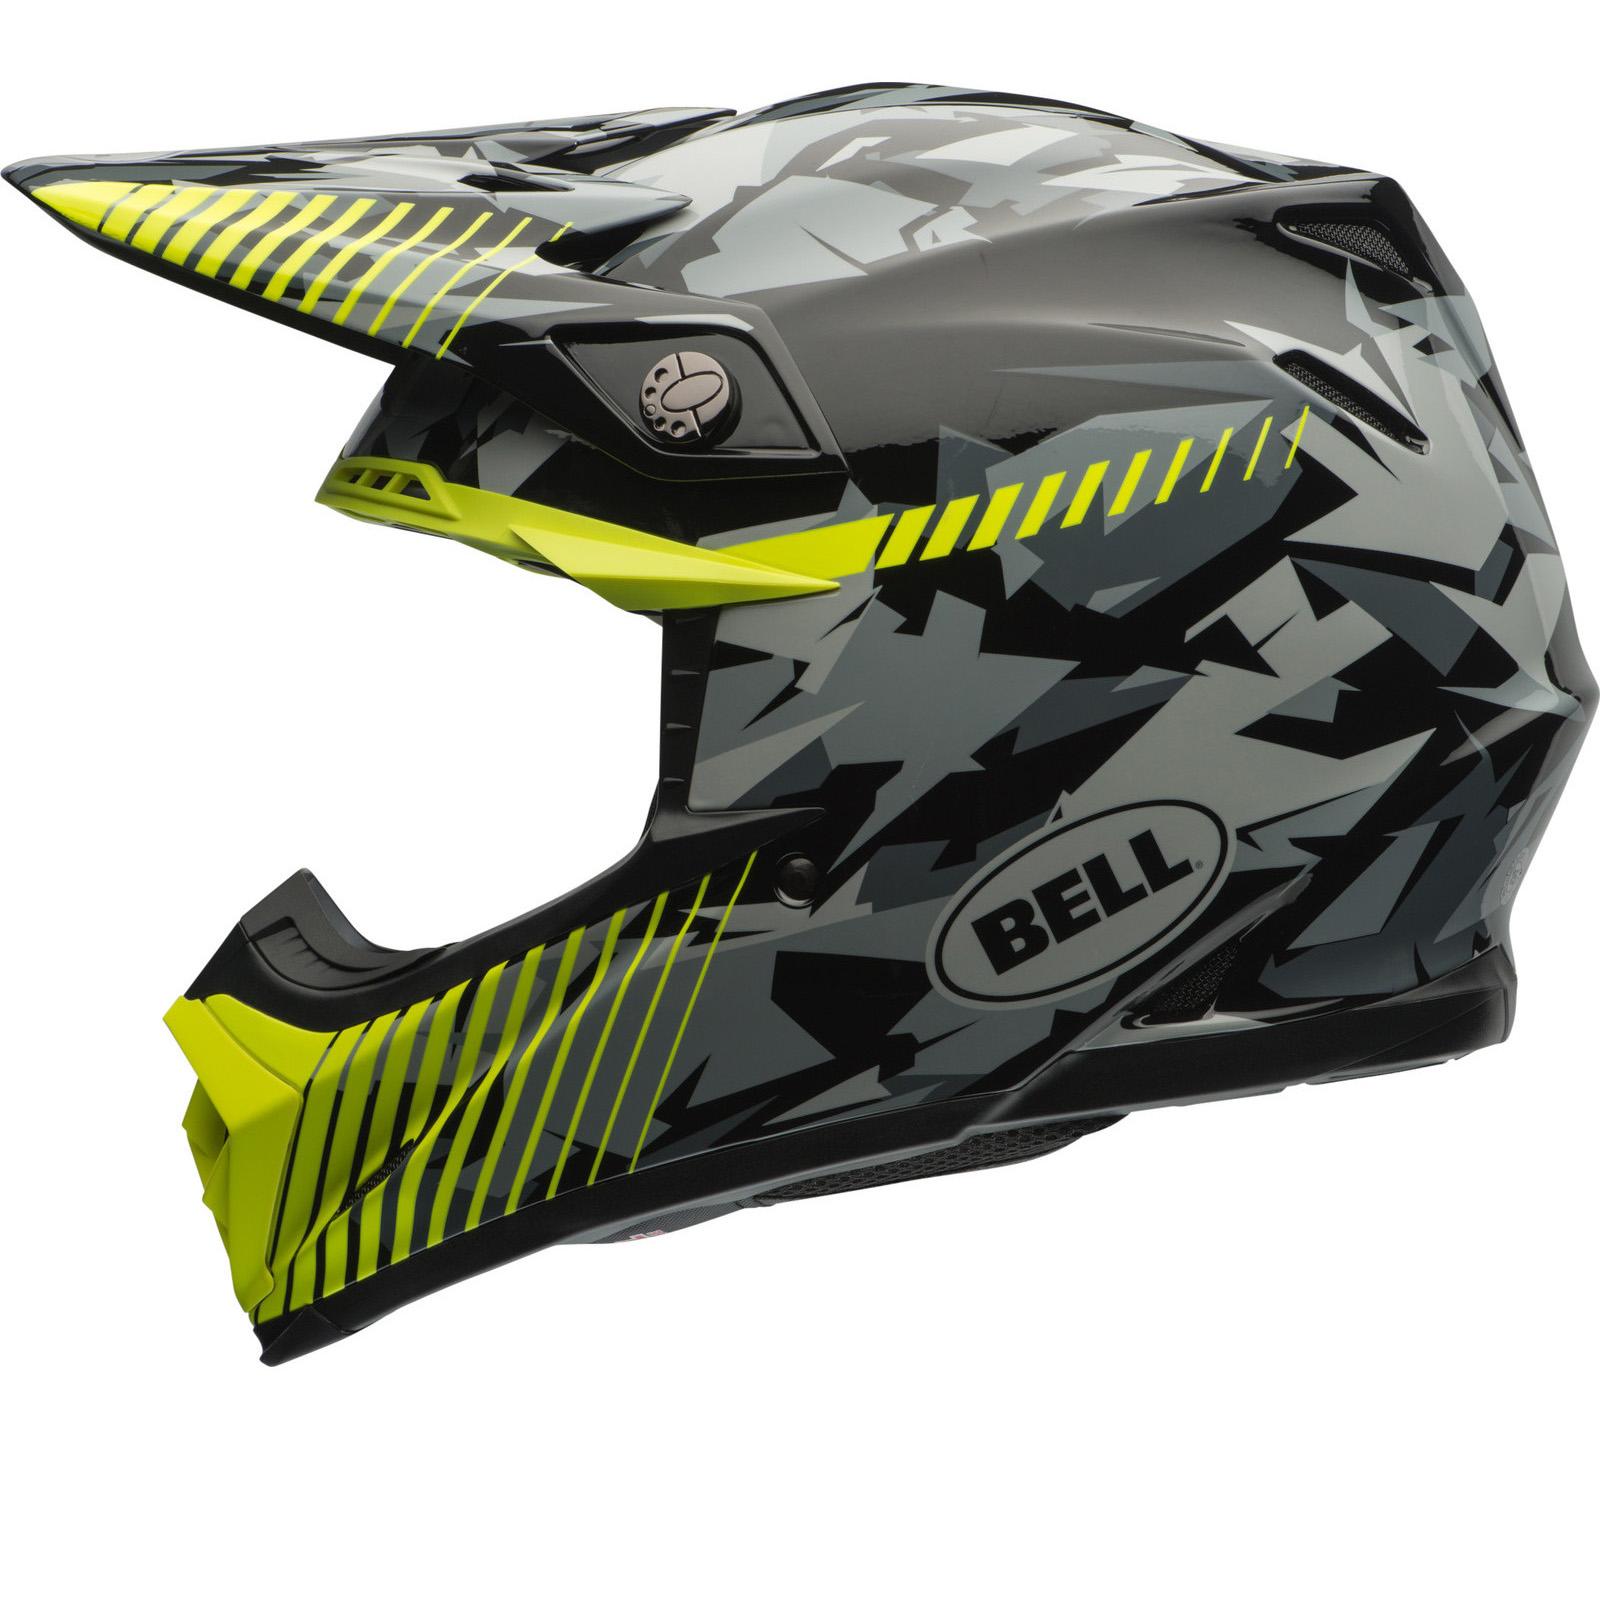 bell moto 9 yellow camo motocross helmet motocross helmets. Black Bedroom Furniture Sets. Home Design Ideas